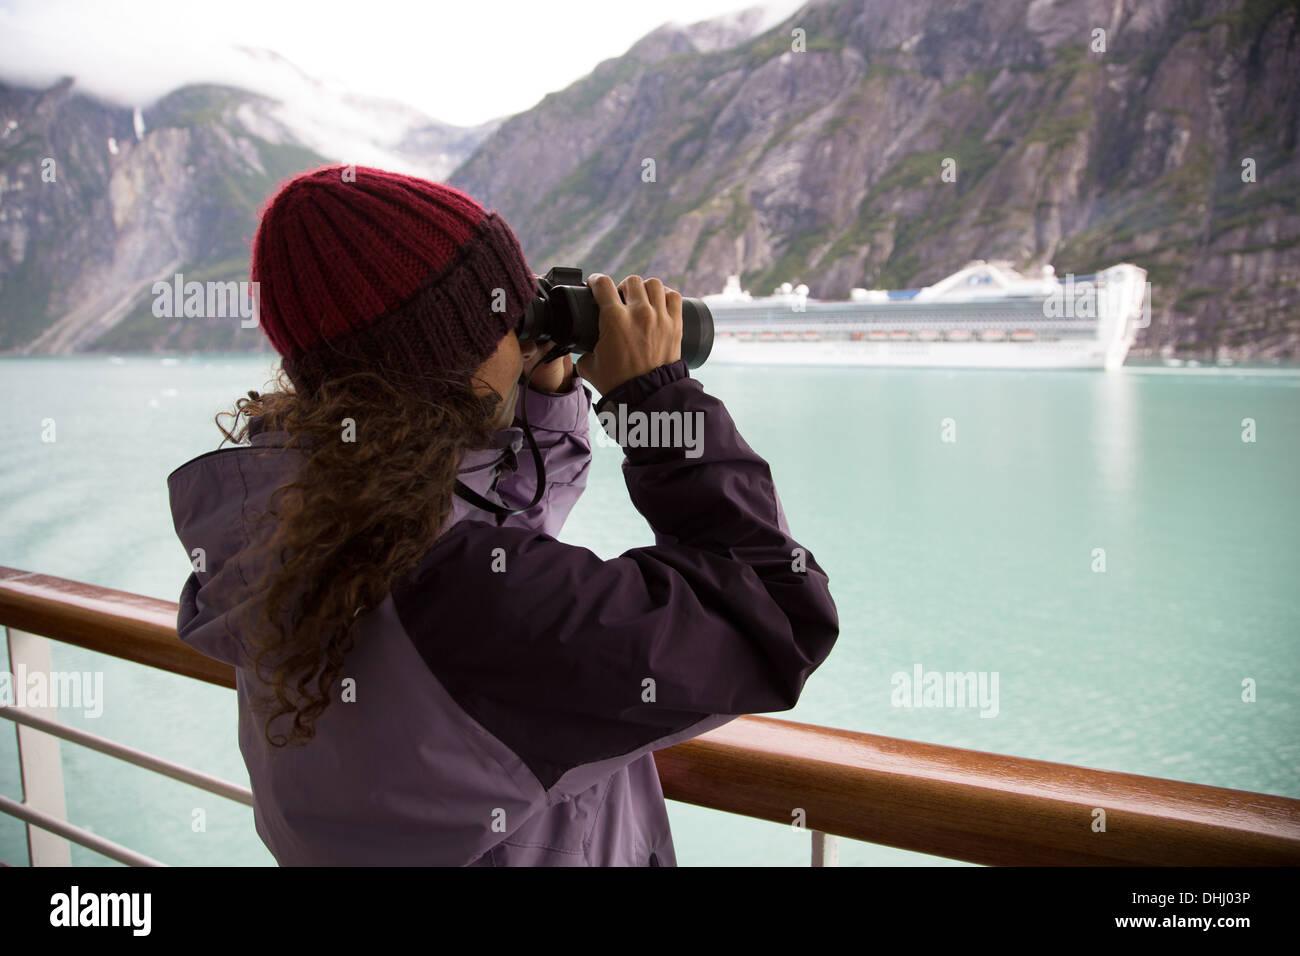 Woman using binoculars on cruise ship, Ketchikan, Alaska, USA - Stock Image